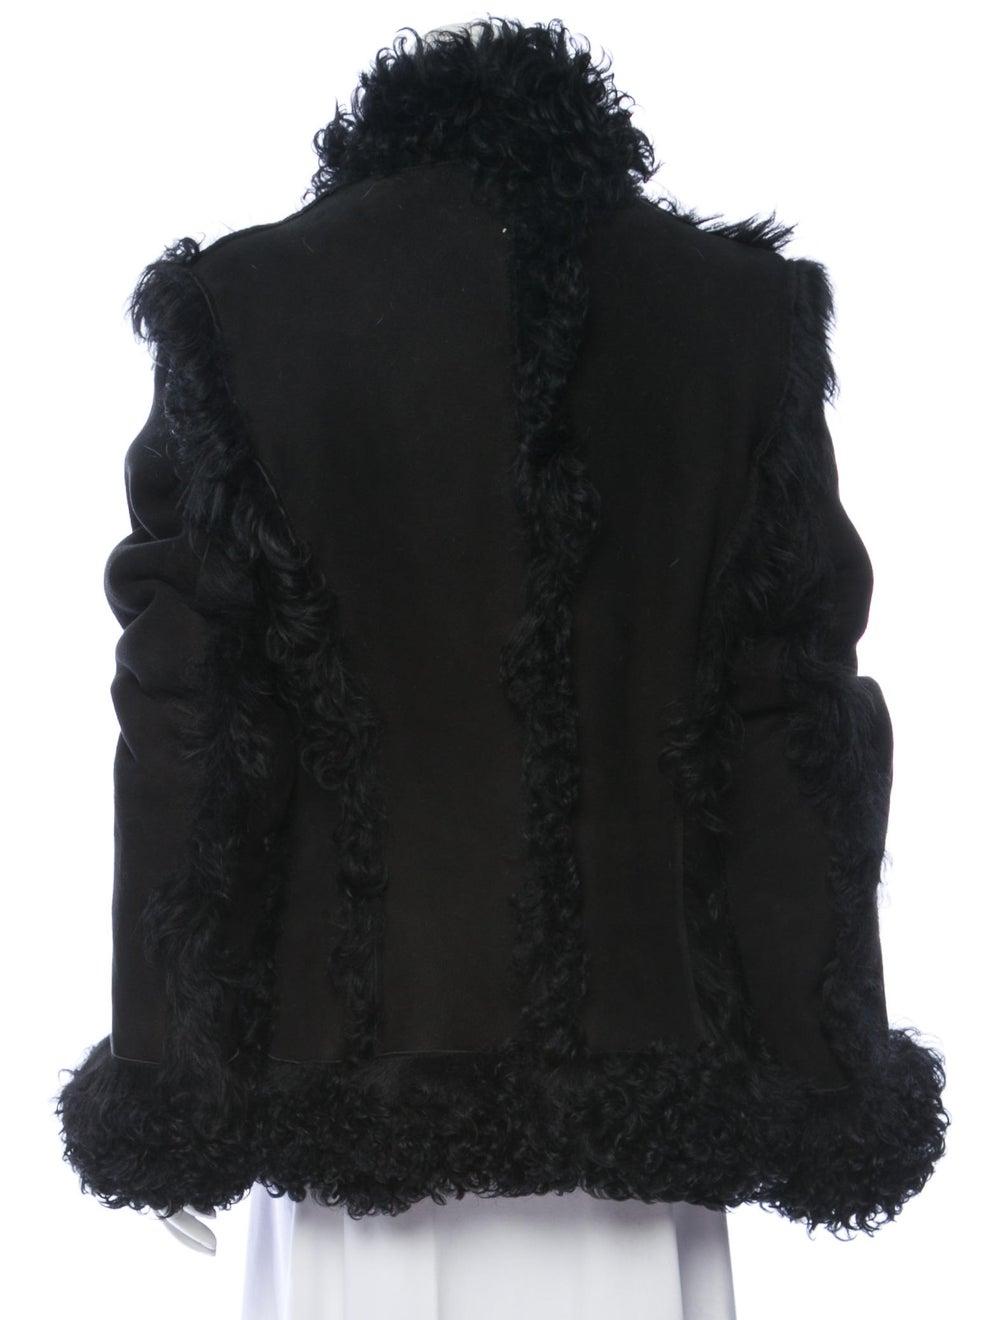 Embroidered Shearling Jacket Black - image 3